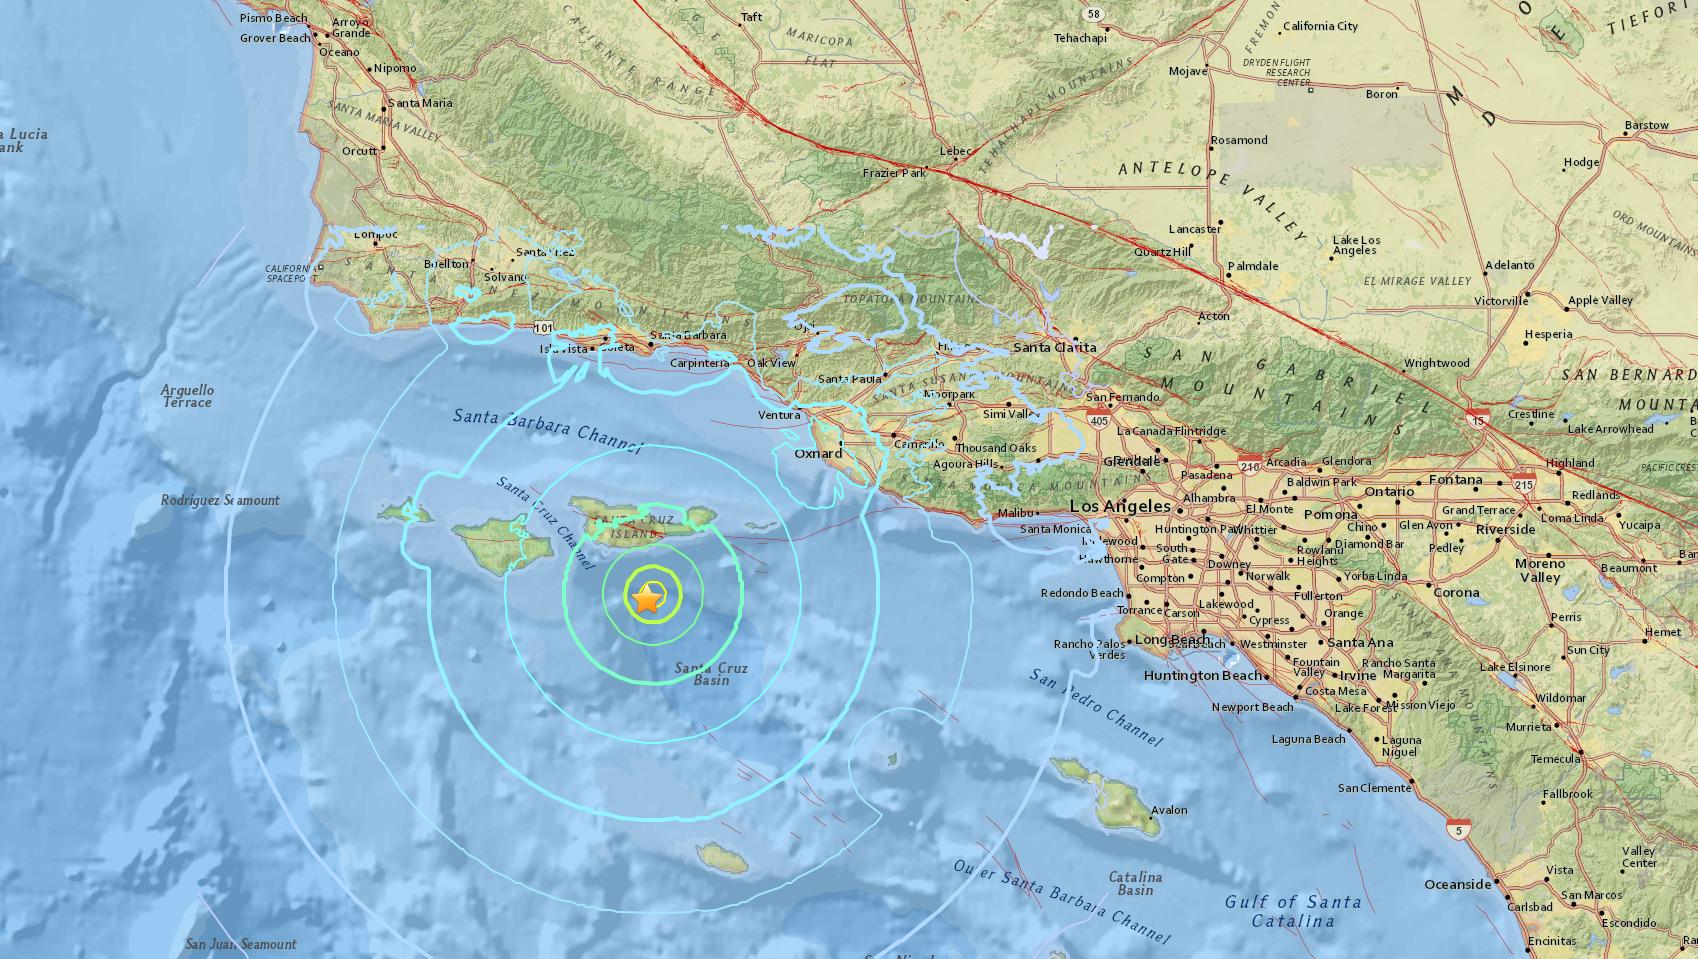 Los Angeles Earthquake Today Magnitude 5 3 Quake Strikes Near